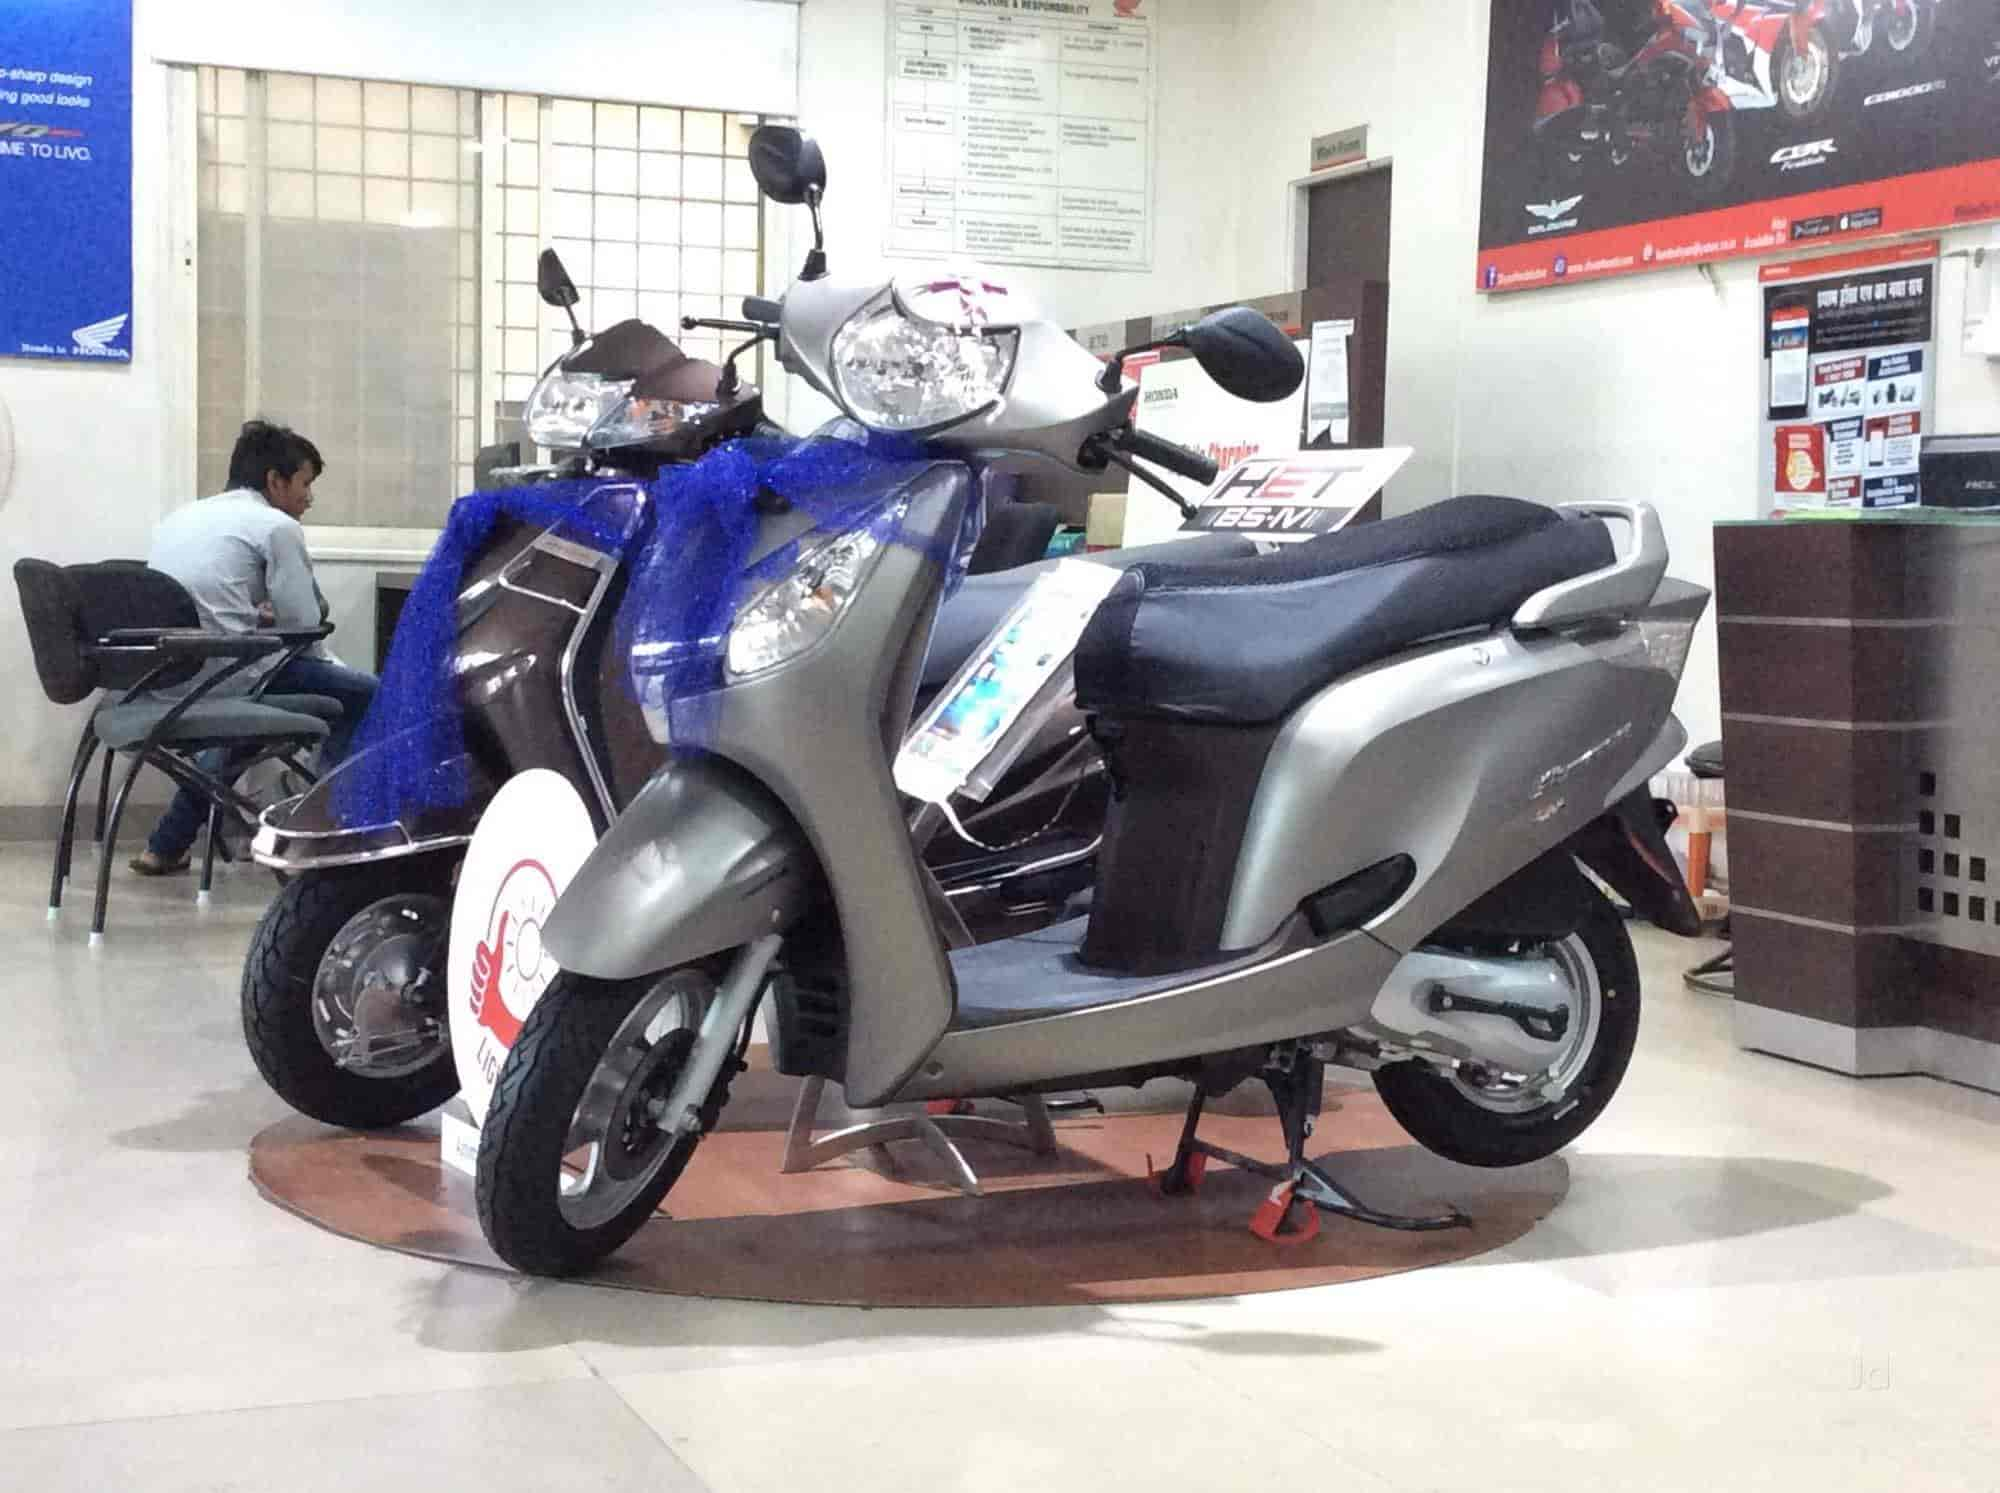 Honda Showroom Near Me >> Shyam Honda Showroom Annapurna Road Motorcycle Dealers Honda In